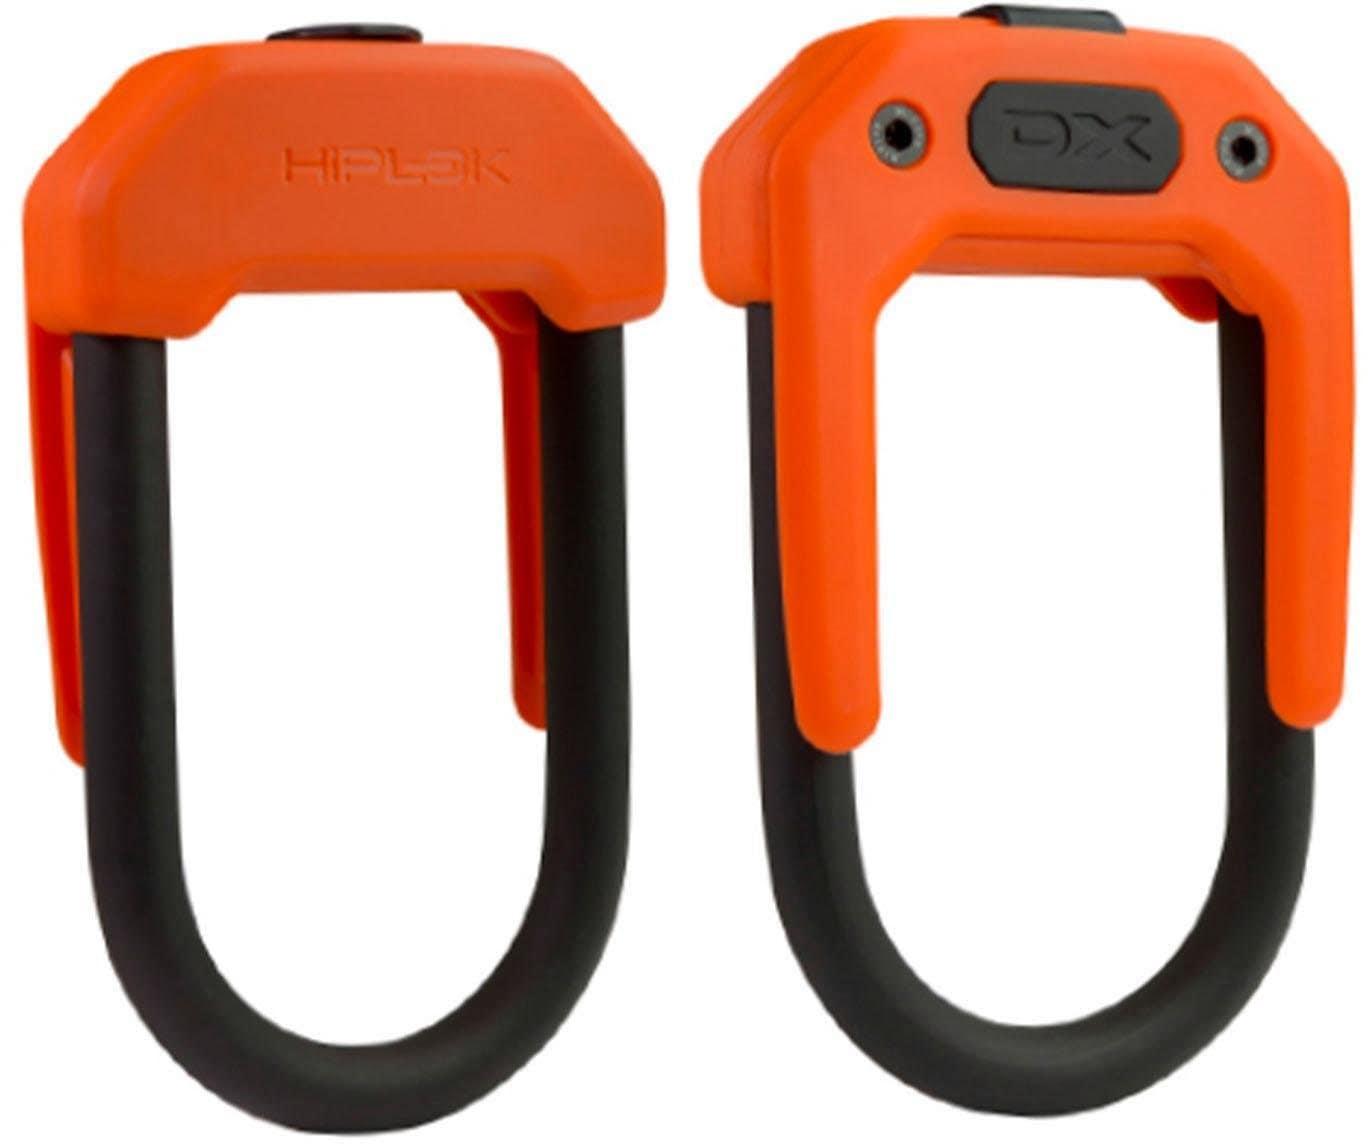 Hiplok Bügelschloss DX Larger Wearable D Lock (4-tlg) Technik & Freizeit/Sport & Freizeit/Fahrräder & Zubehör/Fahrradzubehör/Fahrradschlösser/Bügelschlösser